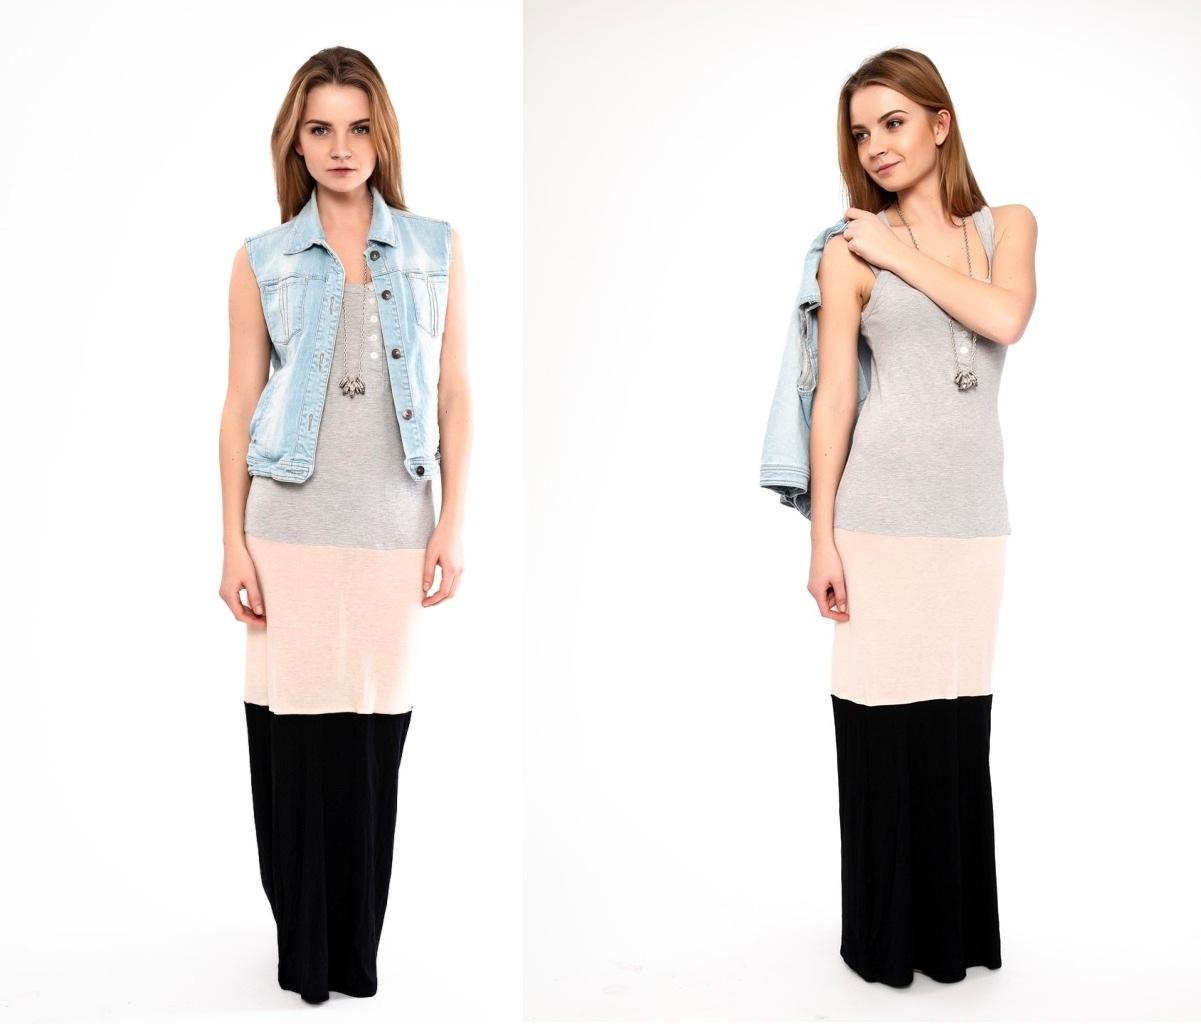 Мастер-класс стилиста: макси-платье из маек - фото №4